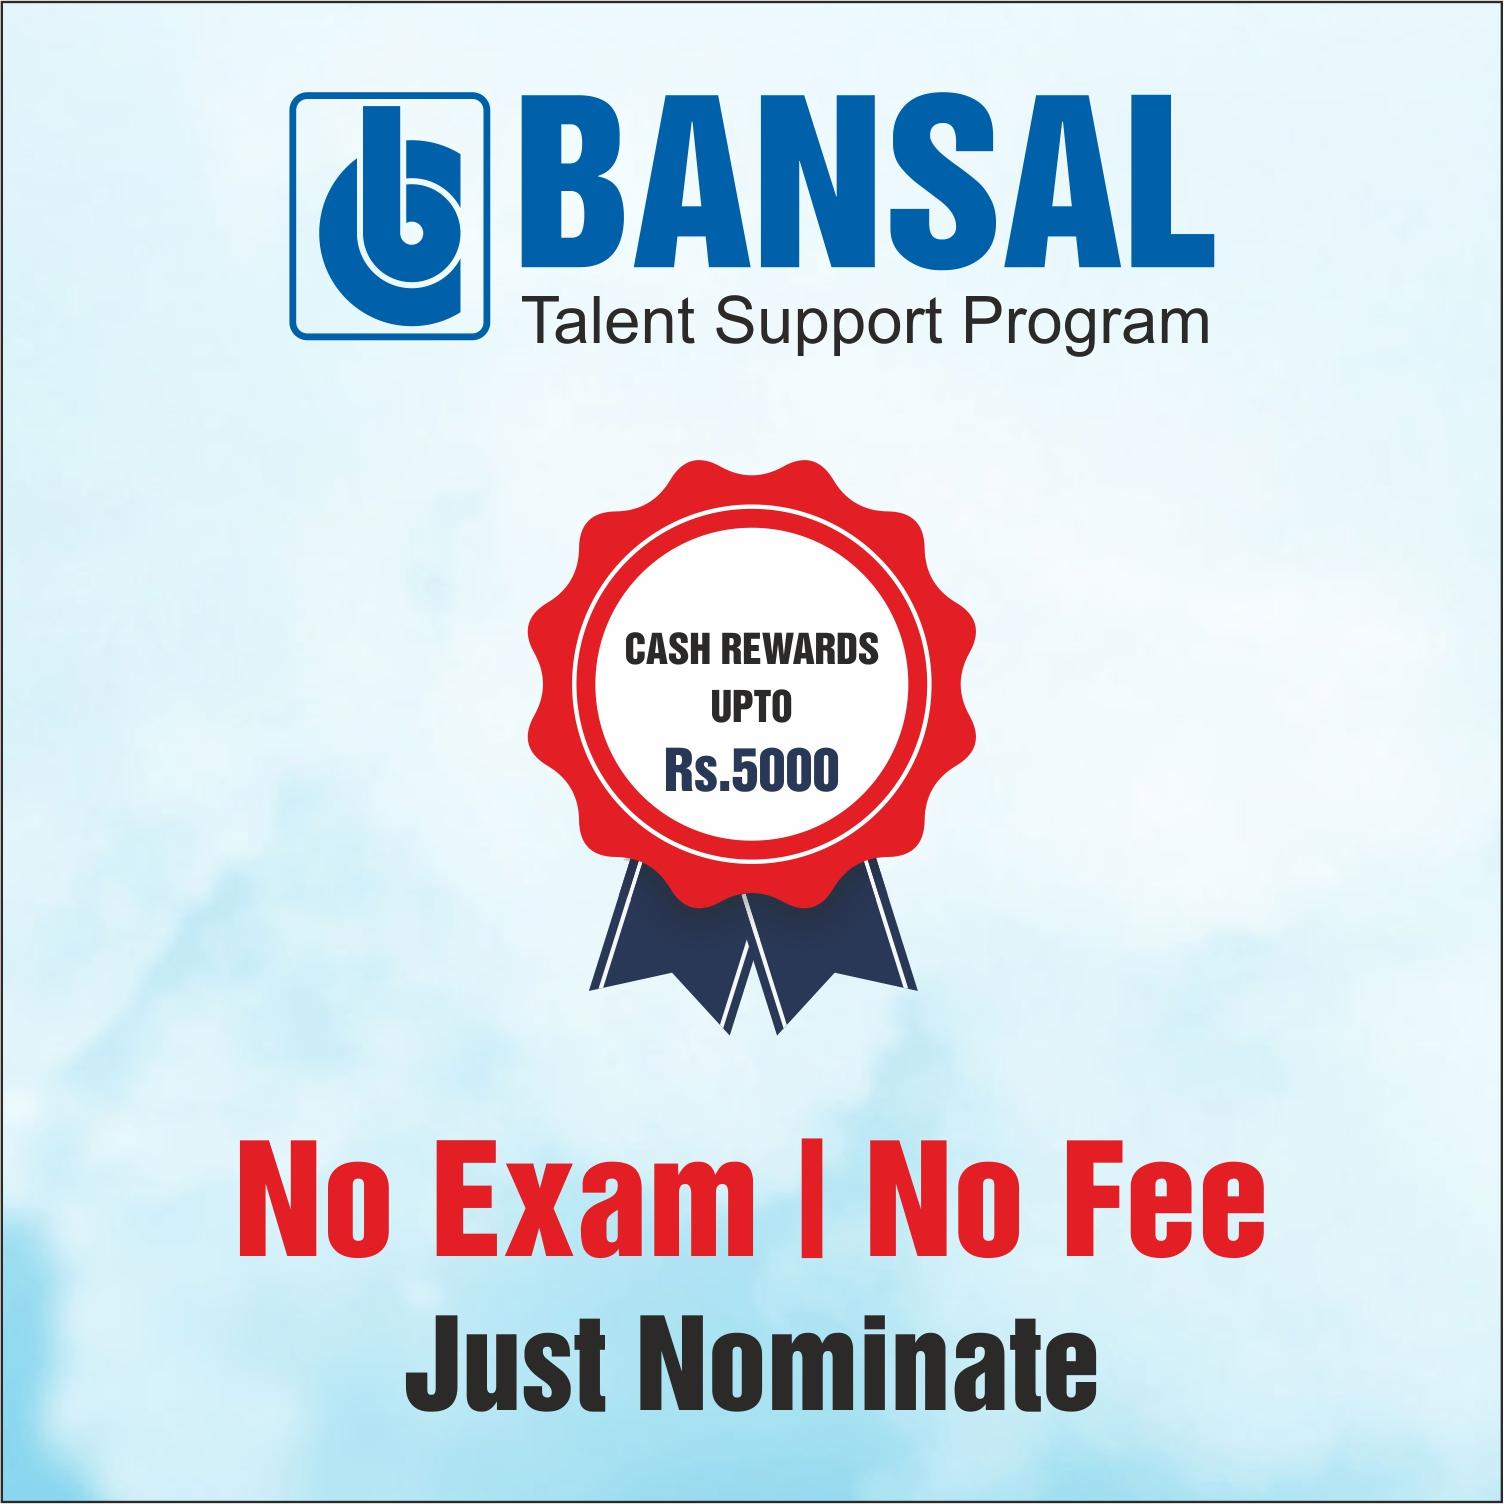 Nominate & Win Cash Rewards upto Rs 5000